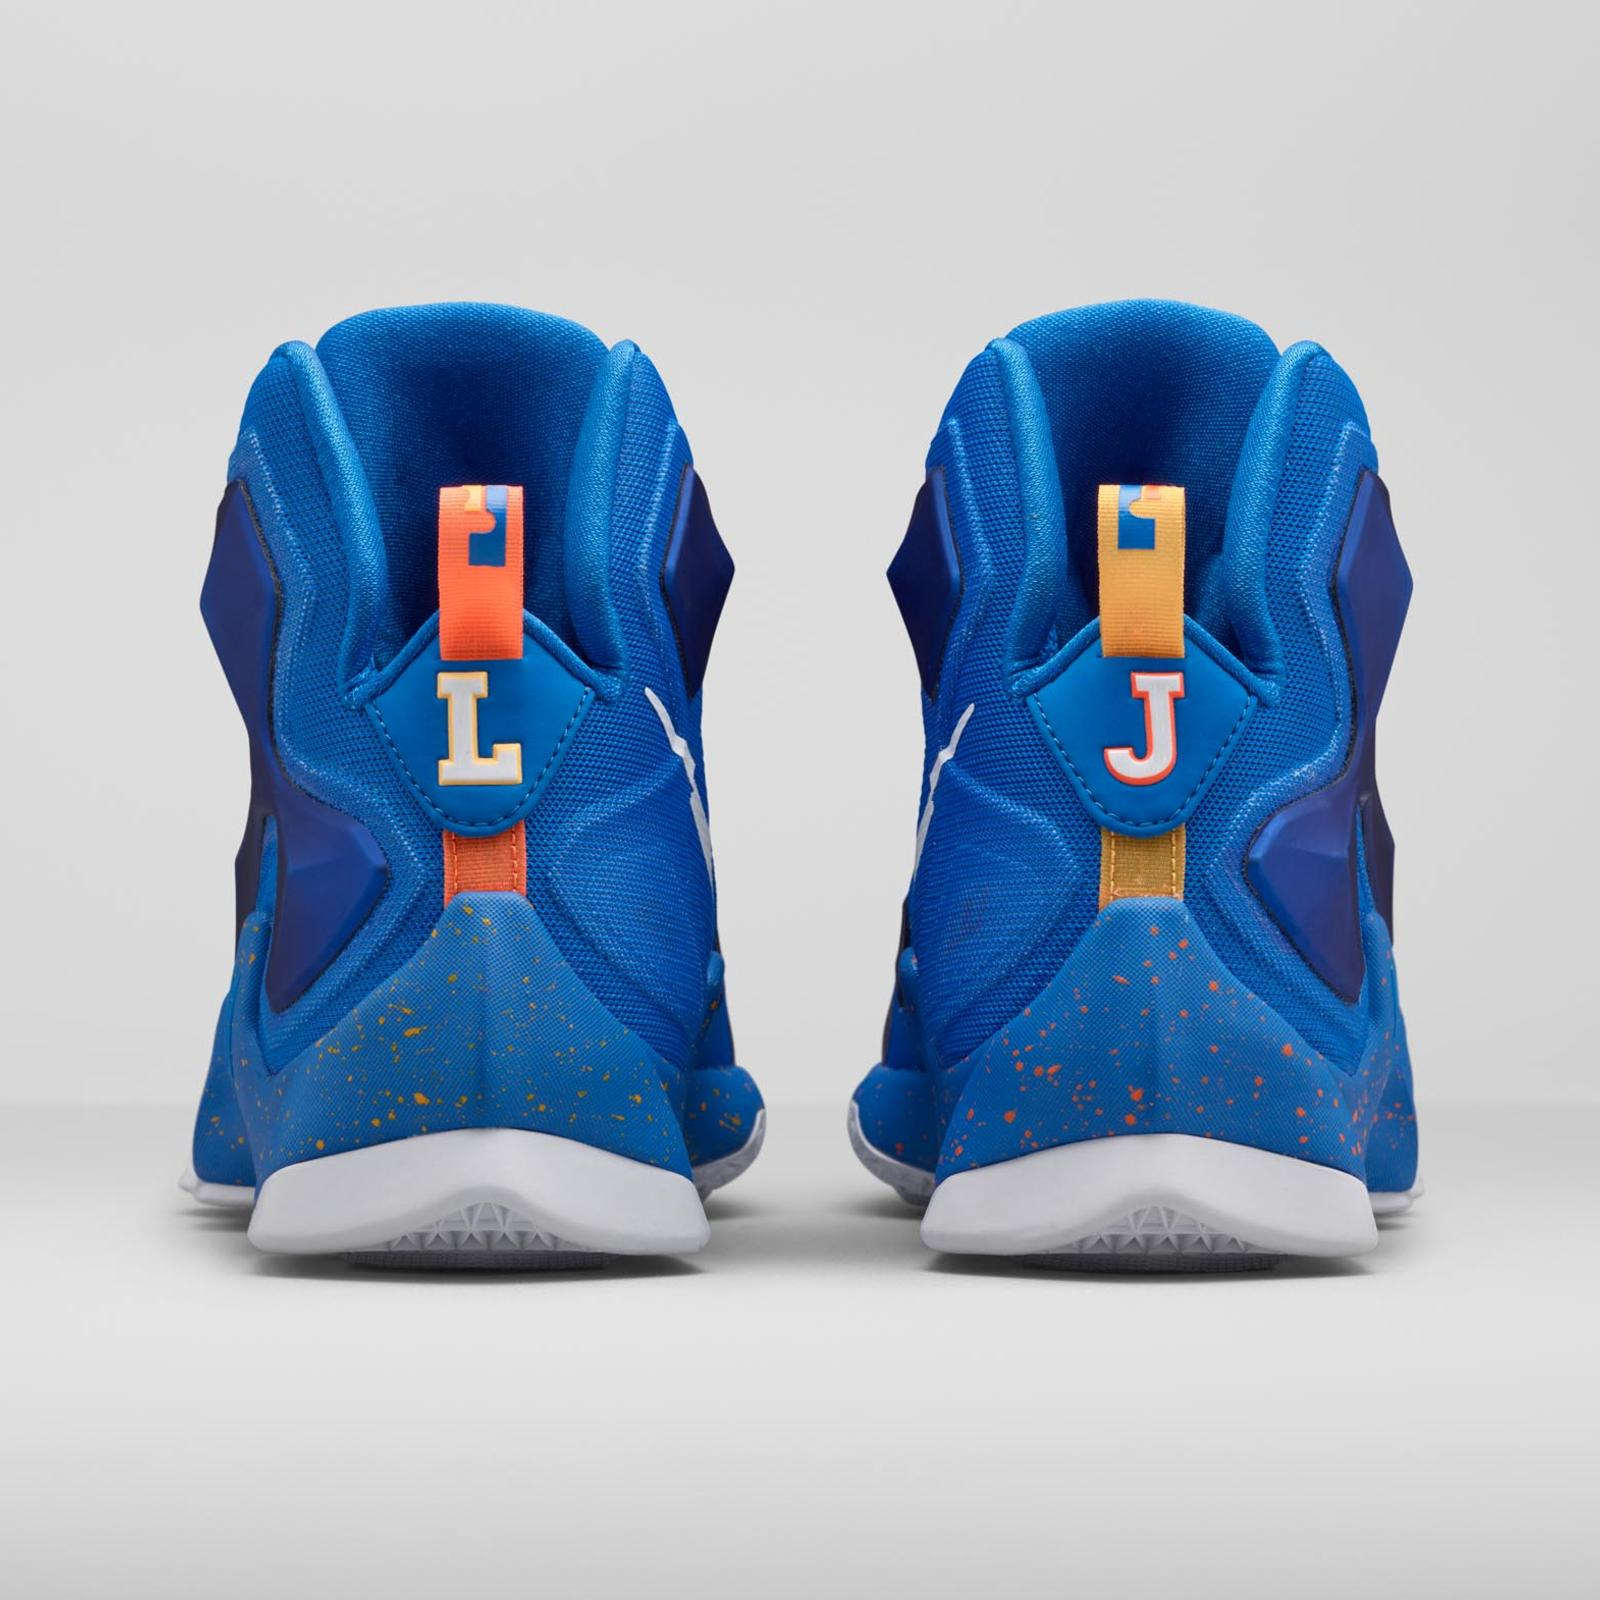 6e90c961a1b97 Introducing the LEBRON 13 Balance Shoe - Nike News